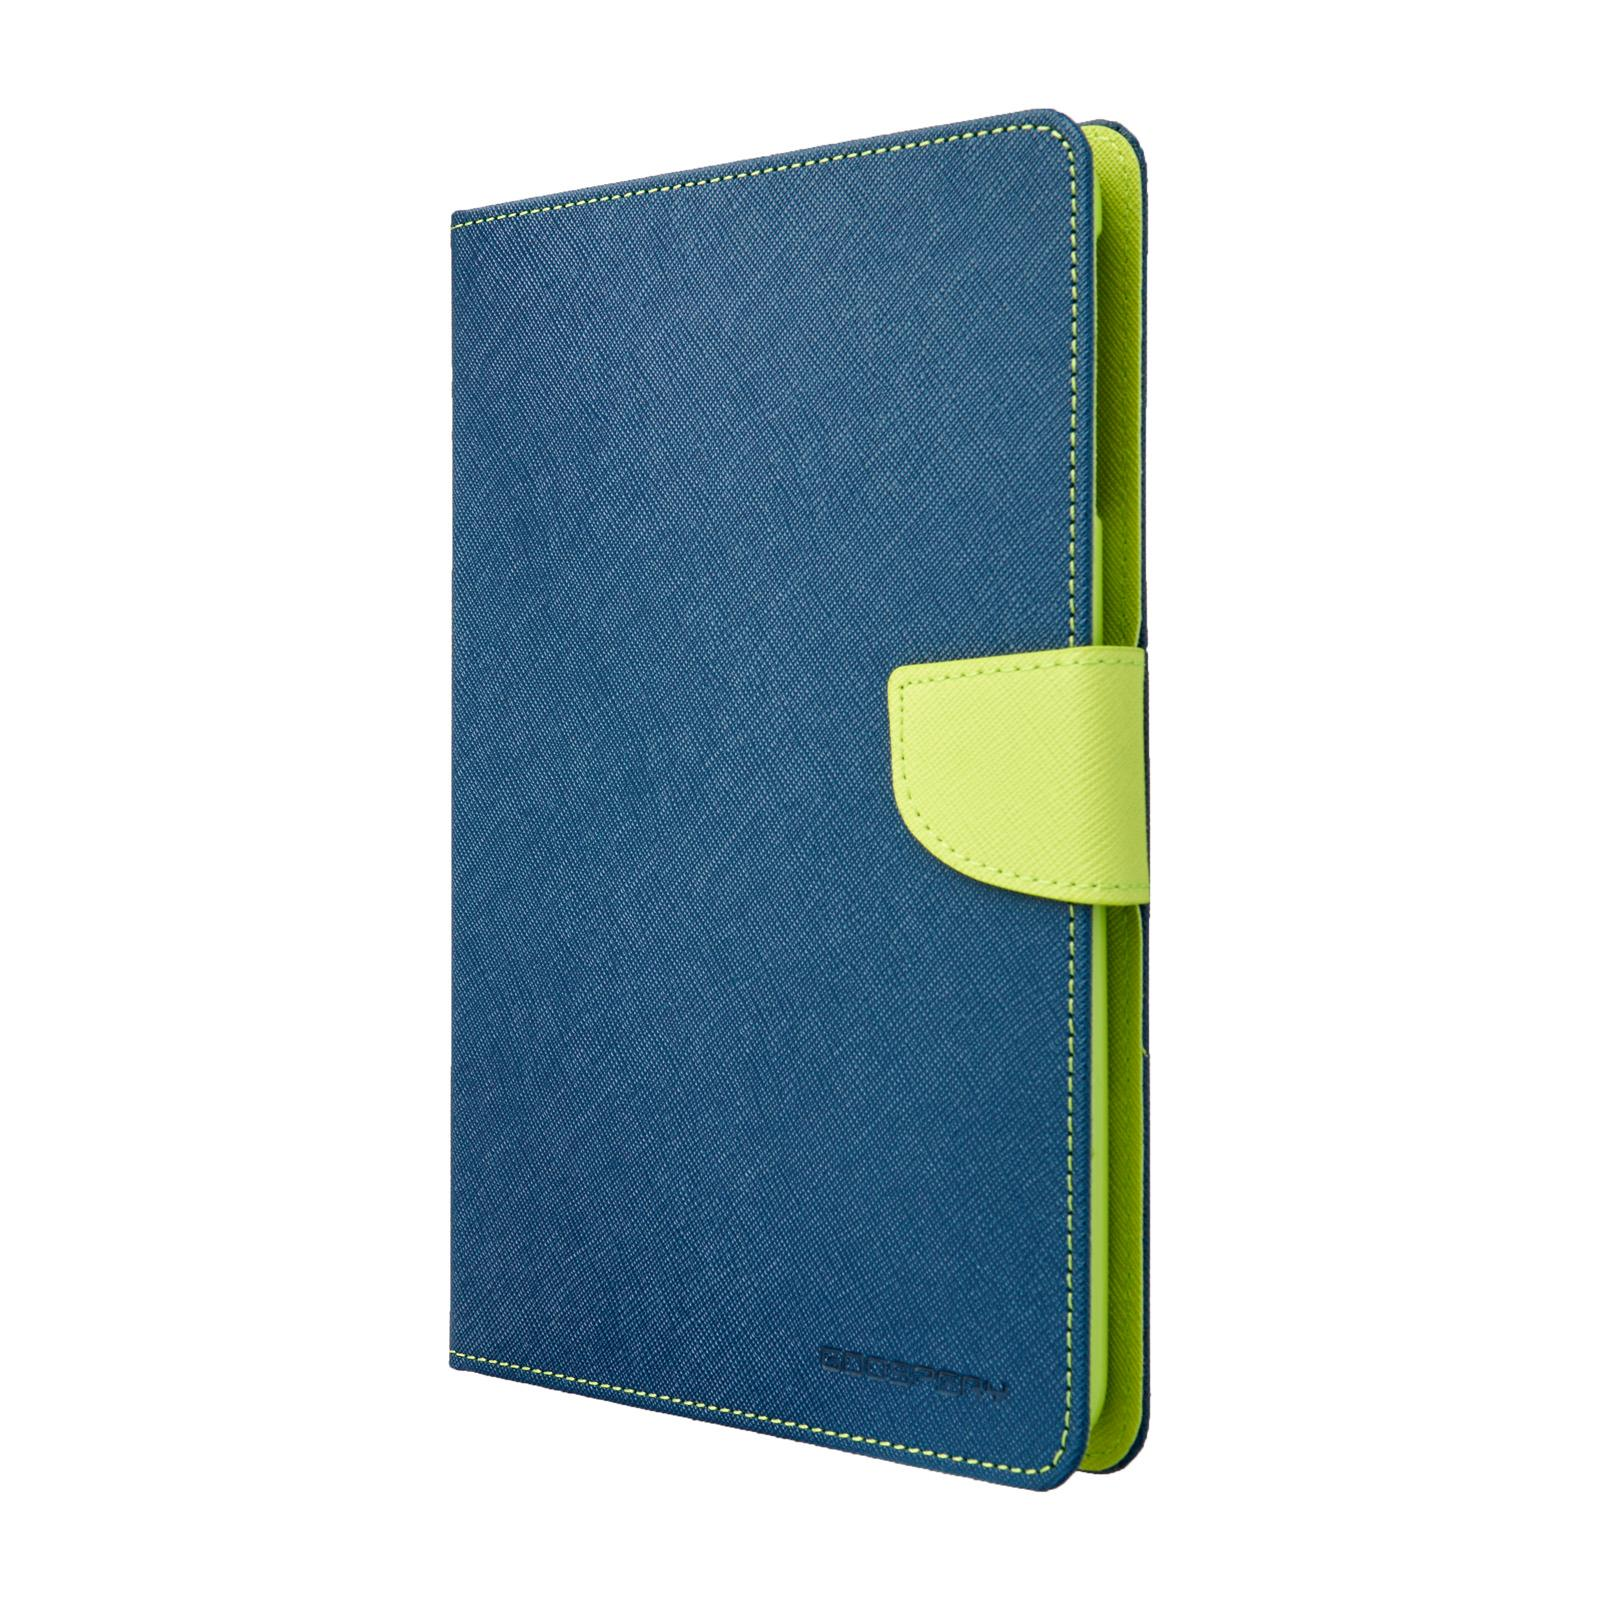 Pouzdro / kryt pro Apple iPad mini 1 / 2 / 3 - Mercury, Fancy Diary Navy/Lime